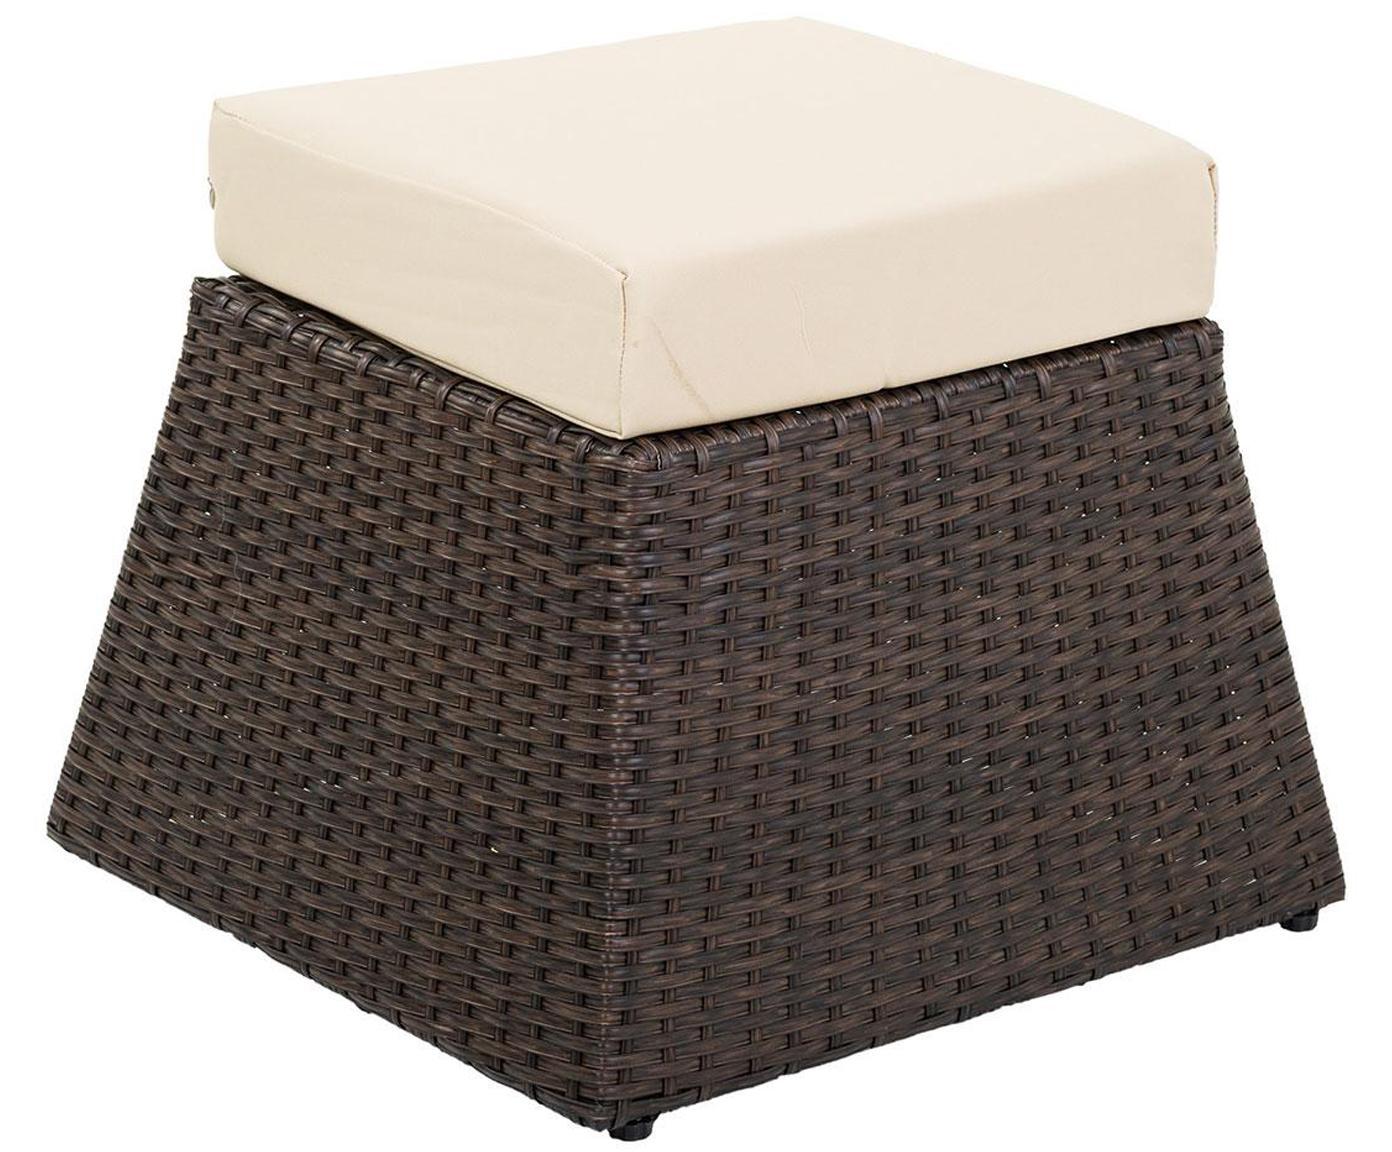 Taburete de exterior Leyre, Tapizado: poliéster, Estructura: ratán, Marrón, beige, An 52 x Al 33 cm